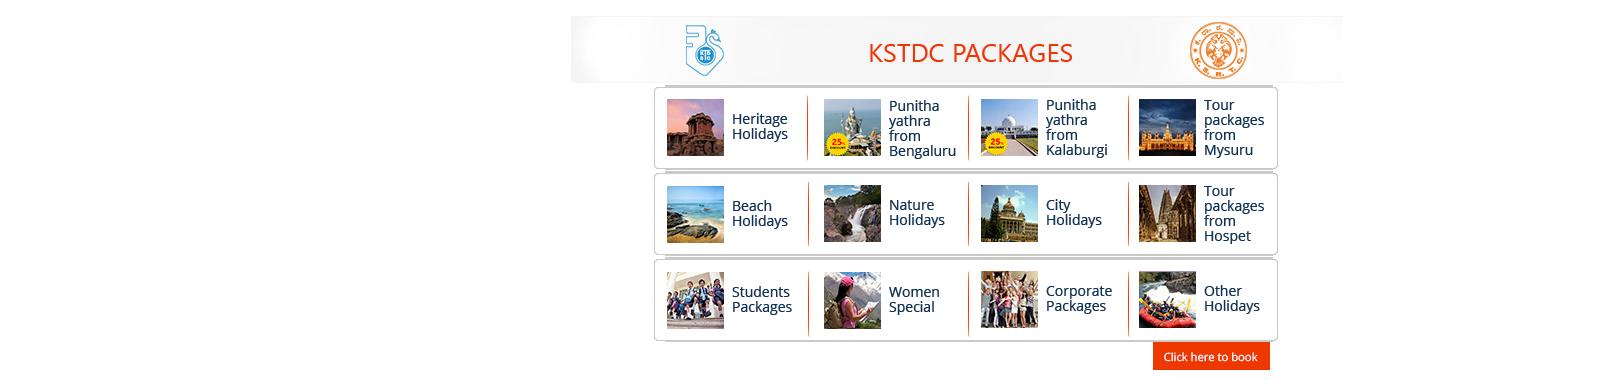 Ksrtc Official Website For Online Bus Ticket Booking